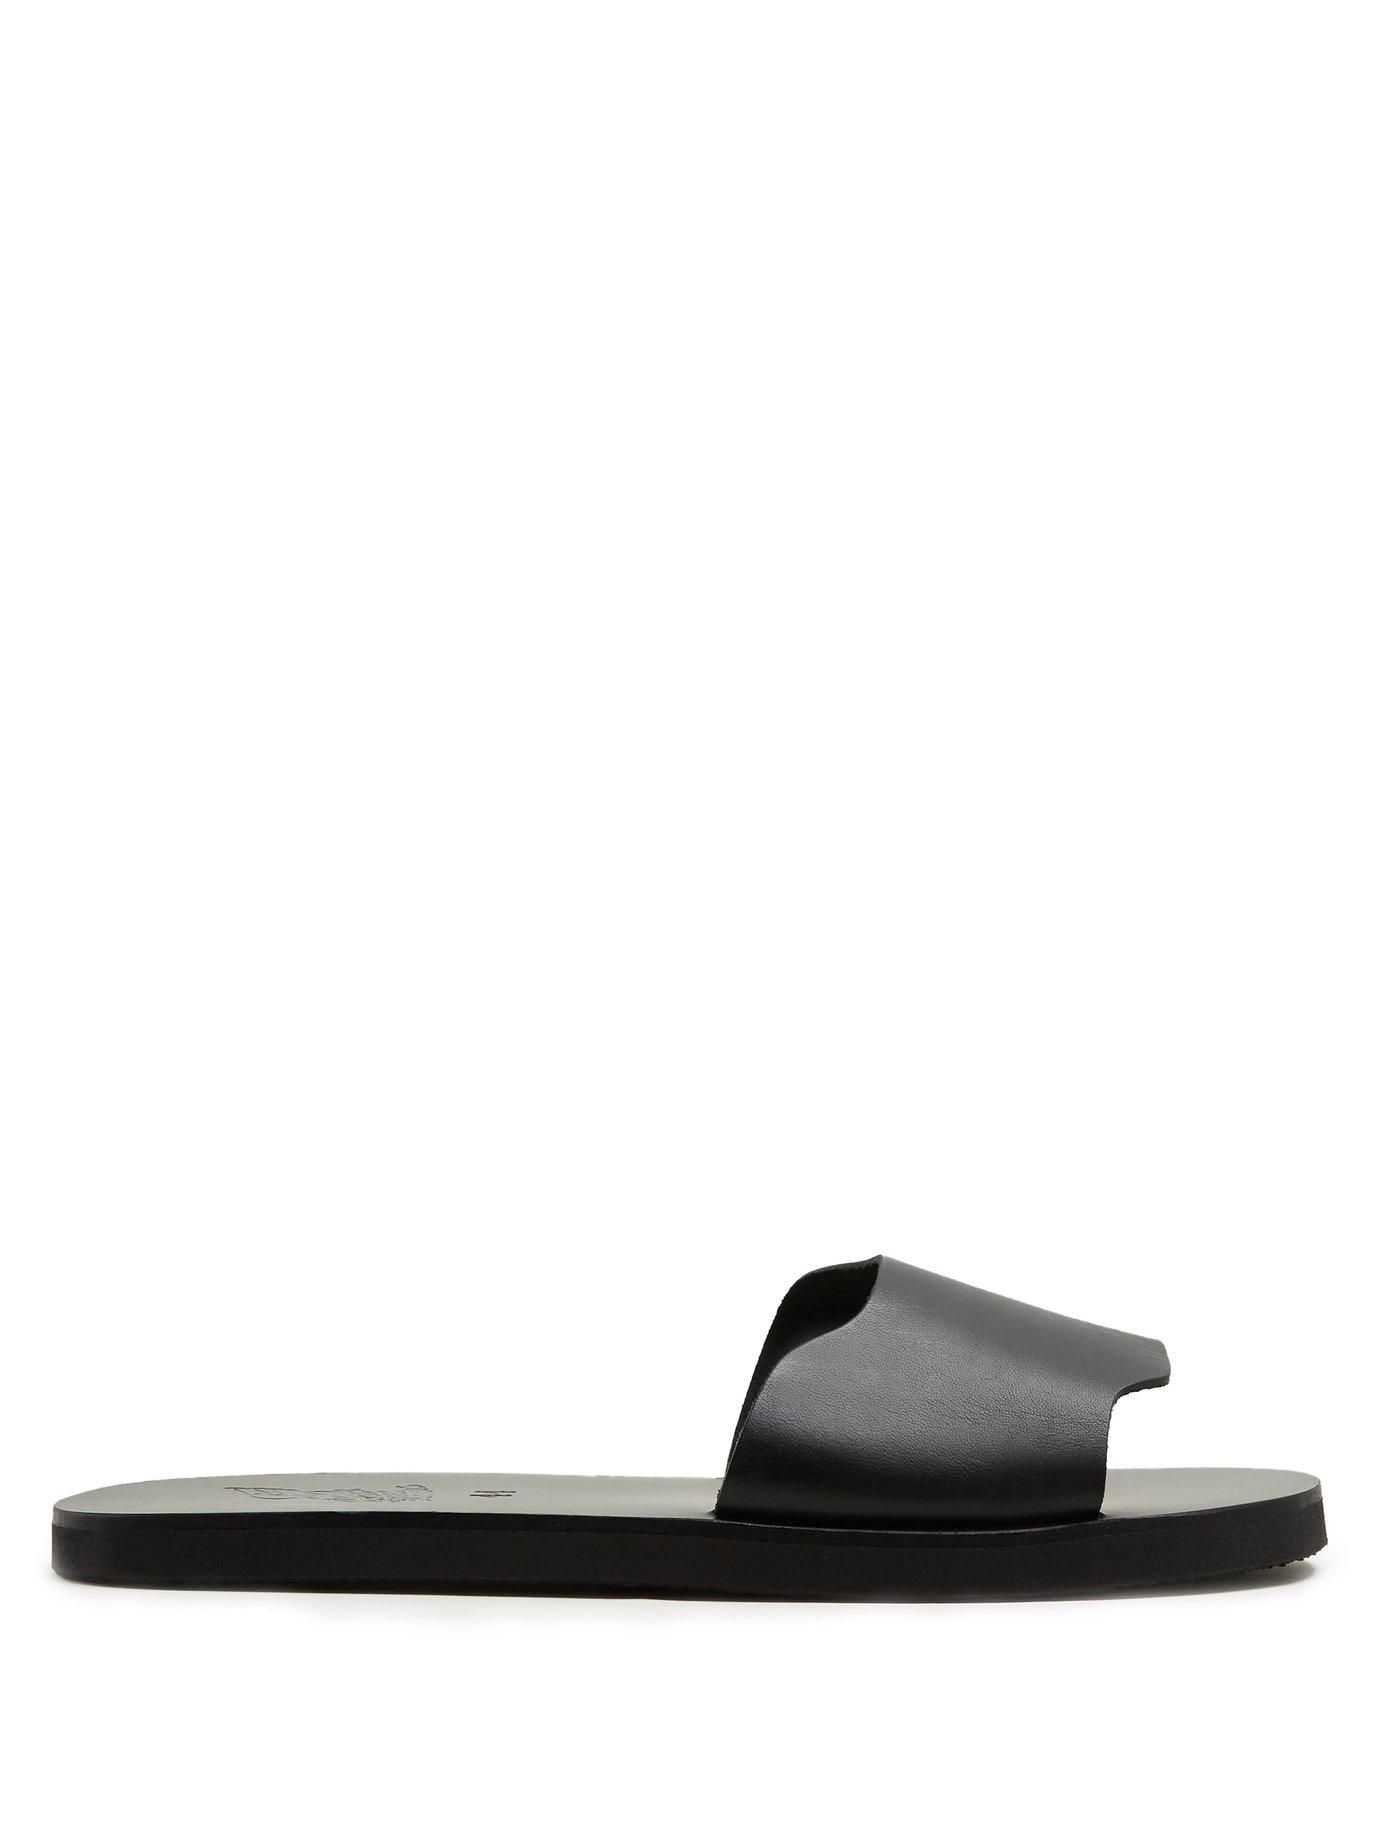 83a71aa38cf9 Ancient Greek Sandals - Ios Leather Slides - Mens - Black